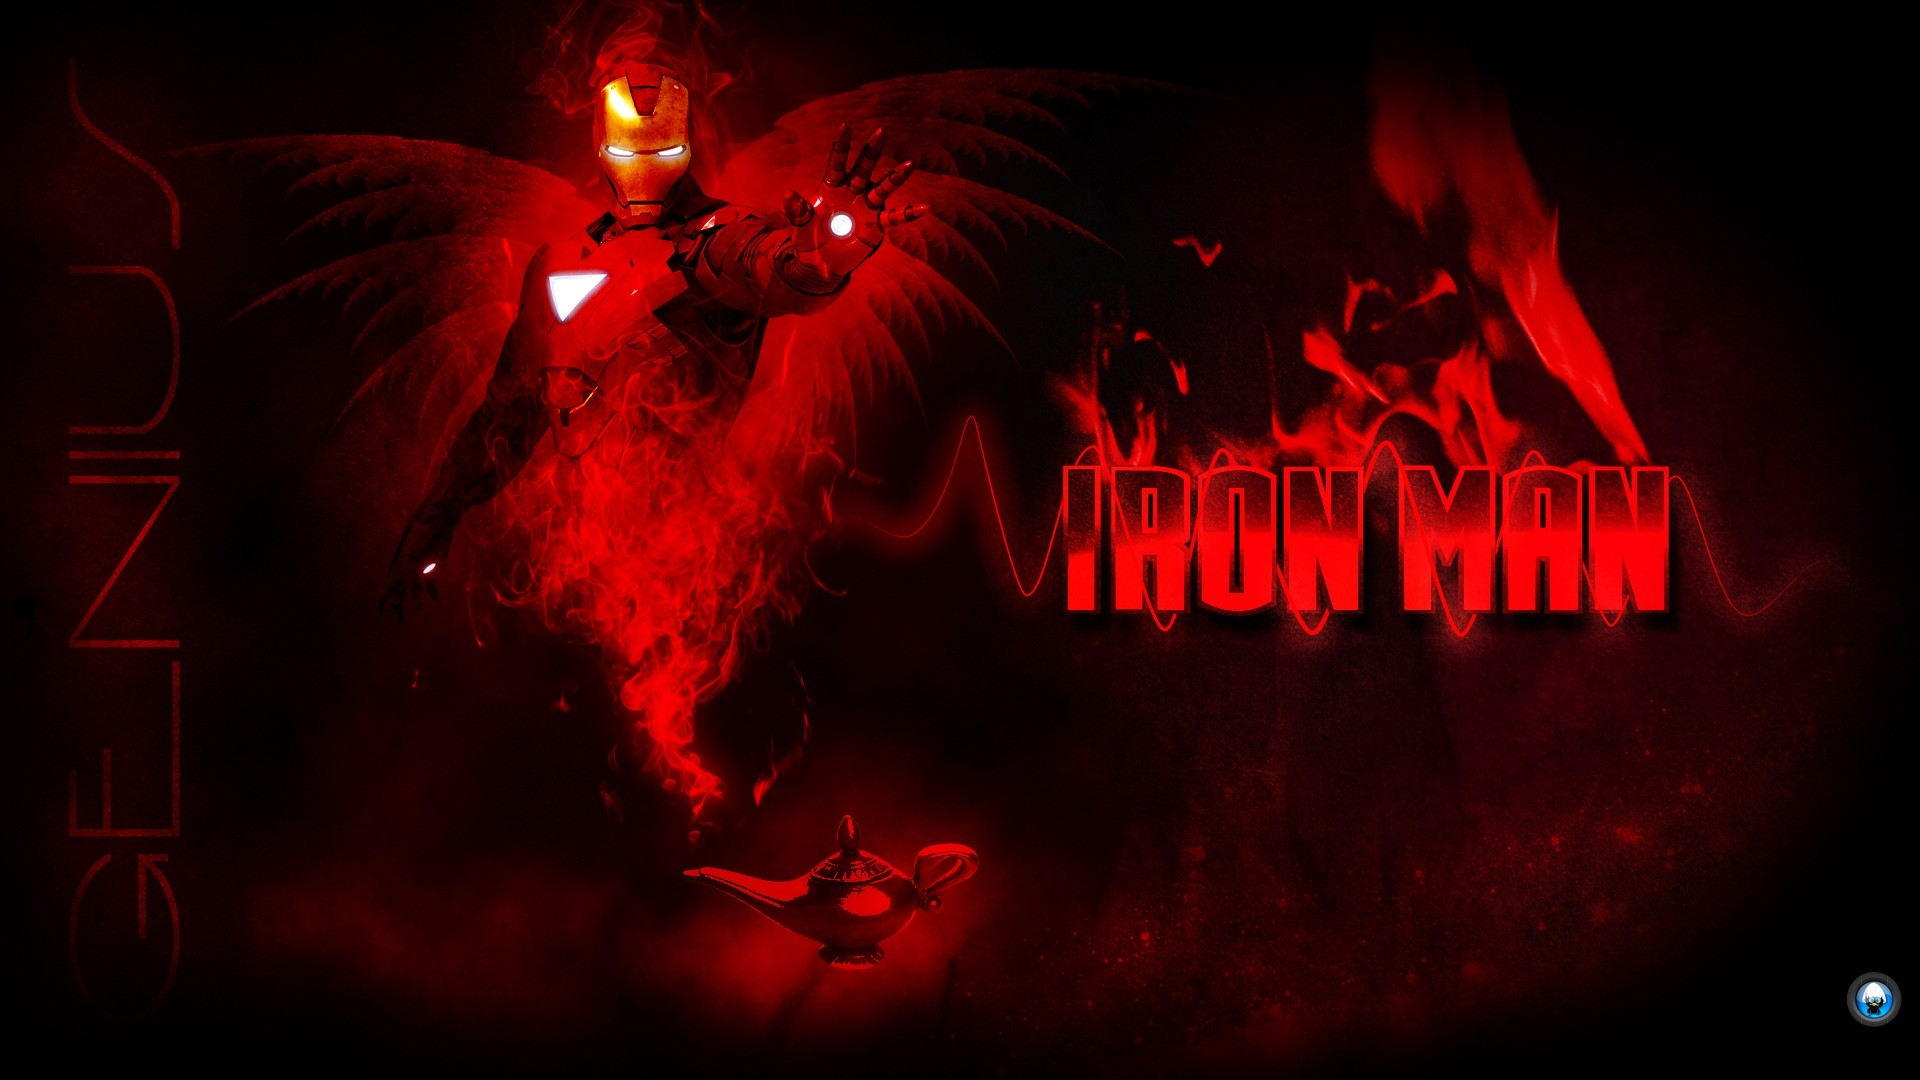 Iron man jarvis animated wallpaper 79 images - Iron man cartoon wallpaper ...